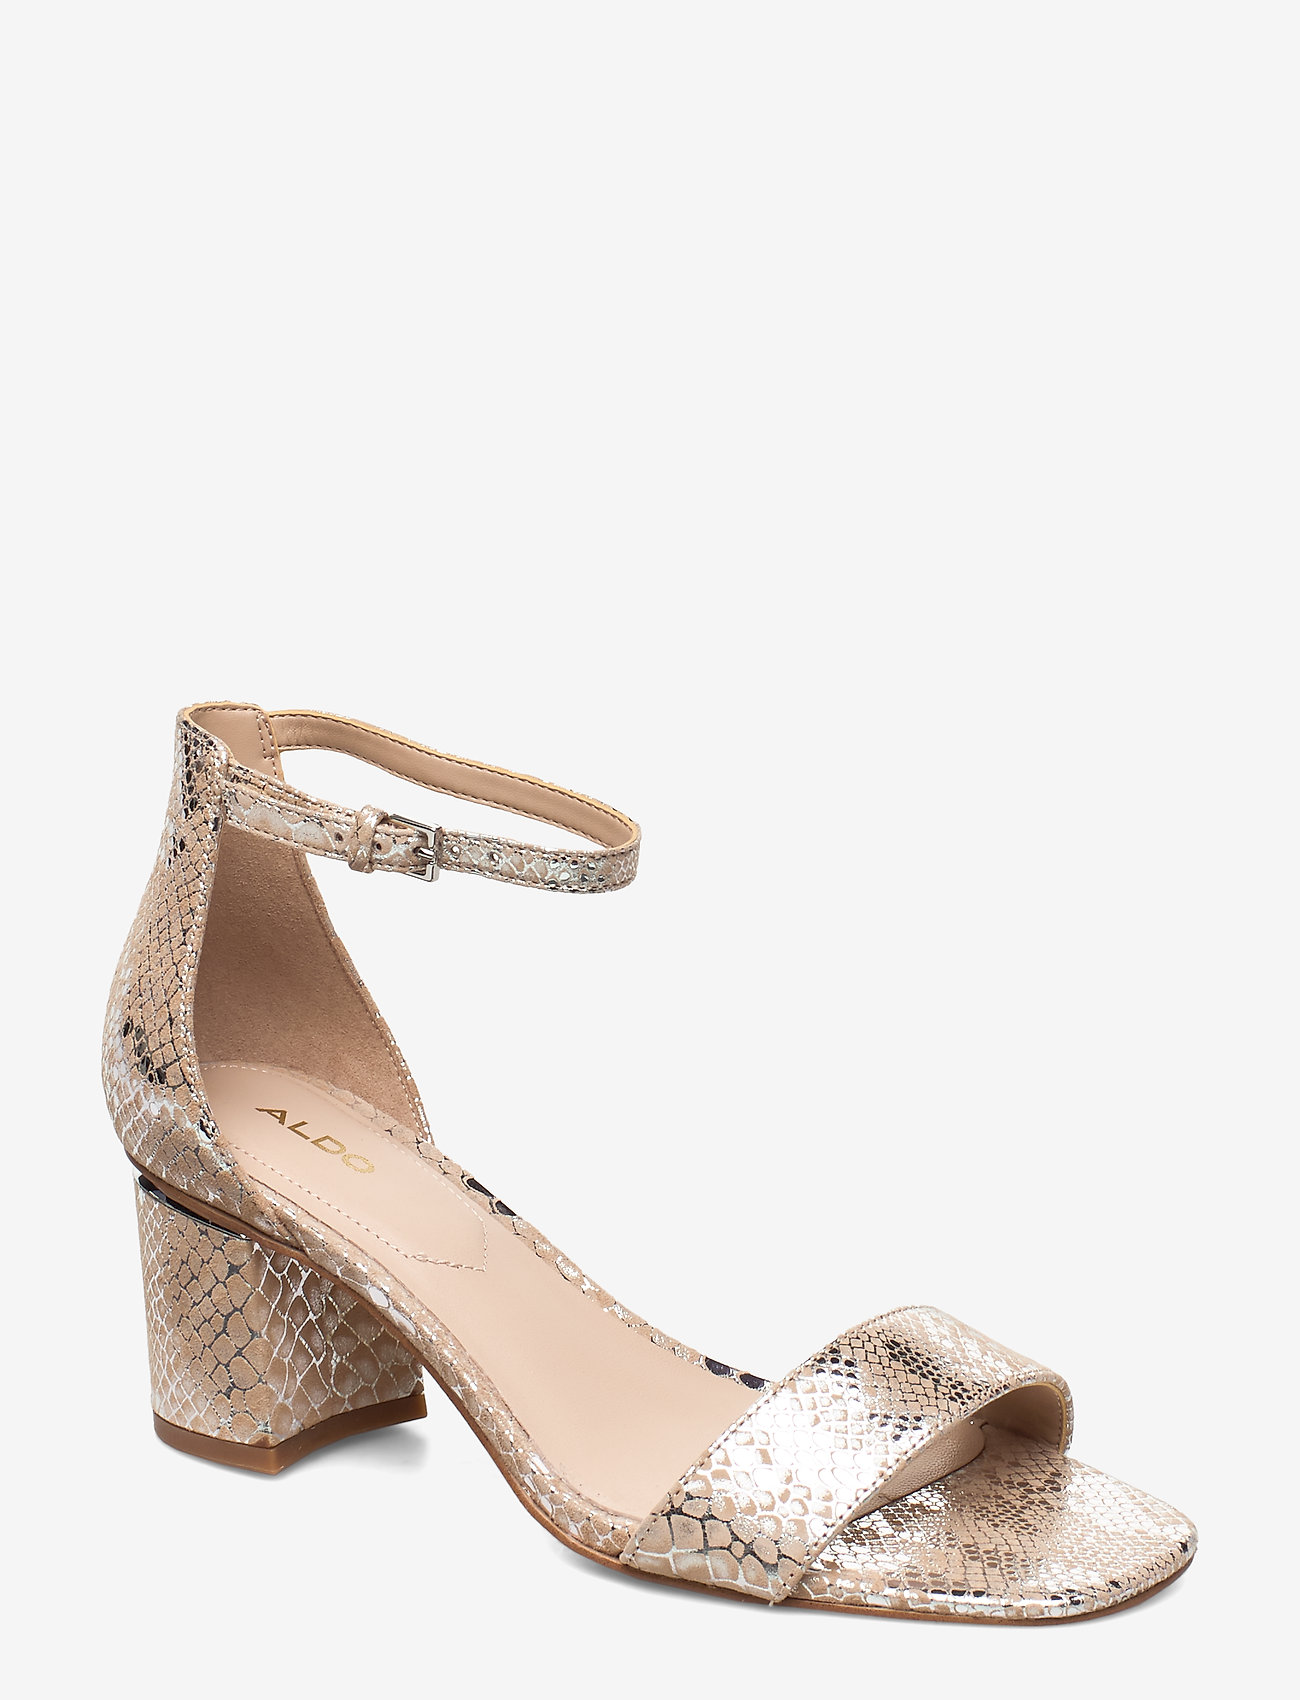 Aldo - VALENTINA - høyhælte sandaler - light silver